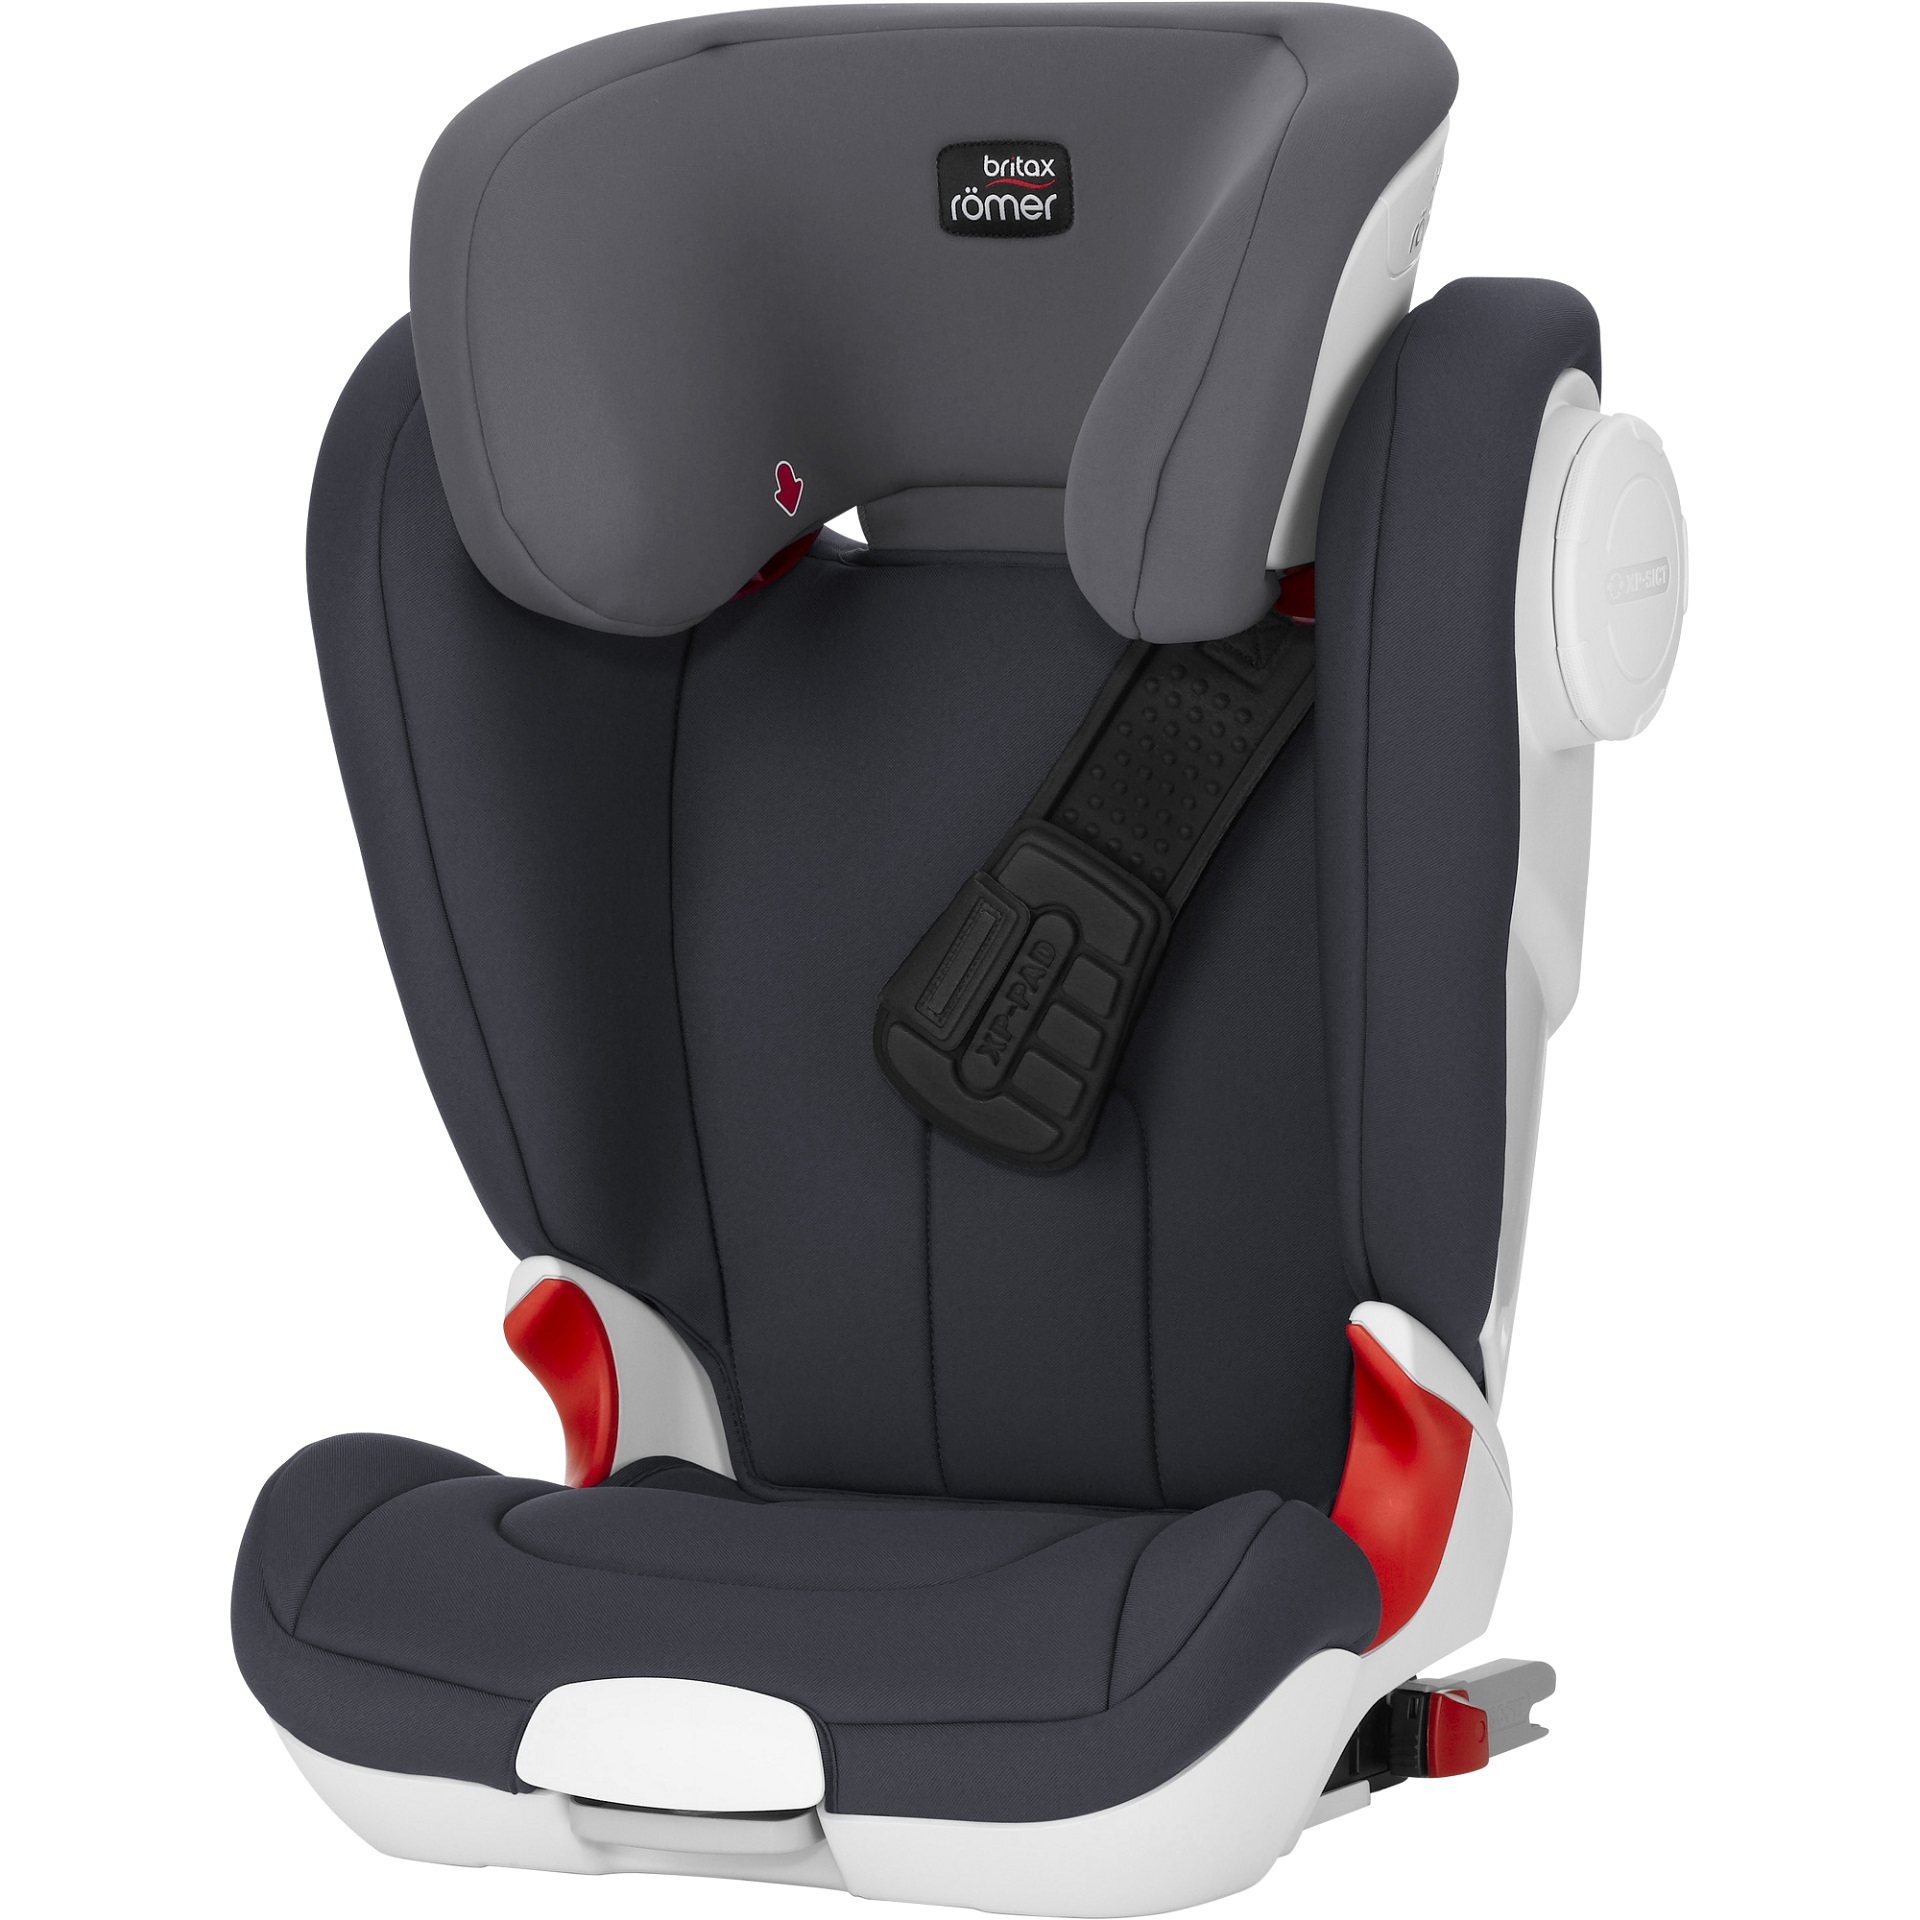 britax r mer child car seat kidfix xp sict 2018 storm grey buy at kidsroom car seats. Black Bedroom Furniture Sets. Home Design Ideas